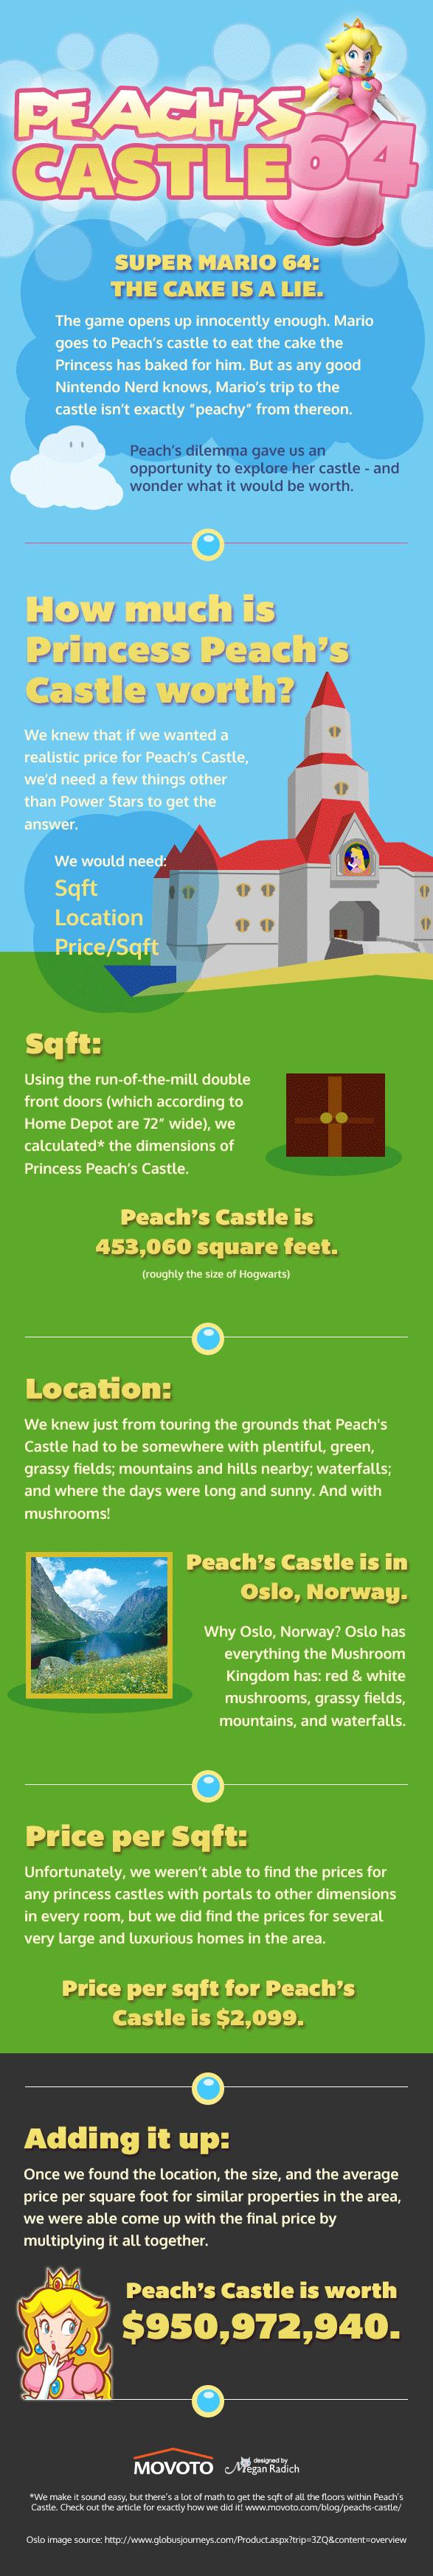 peachs_castle_infographic